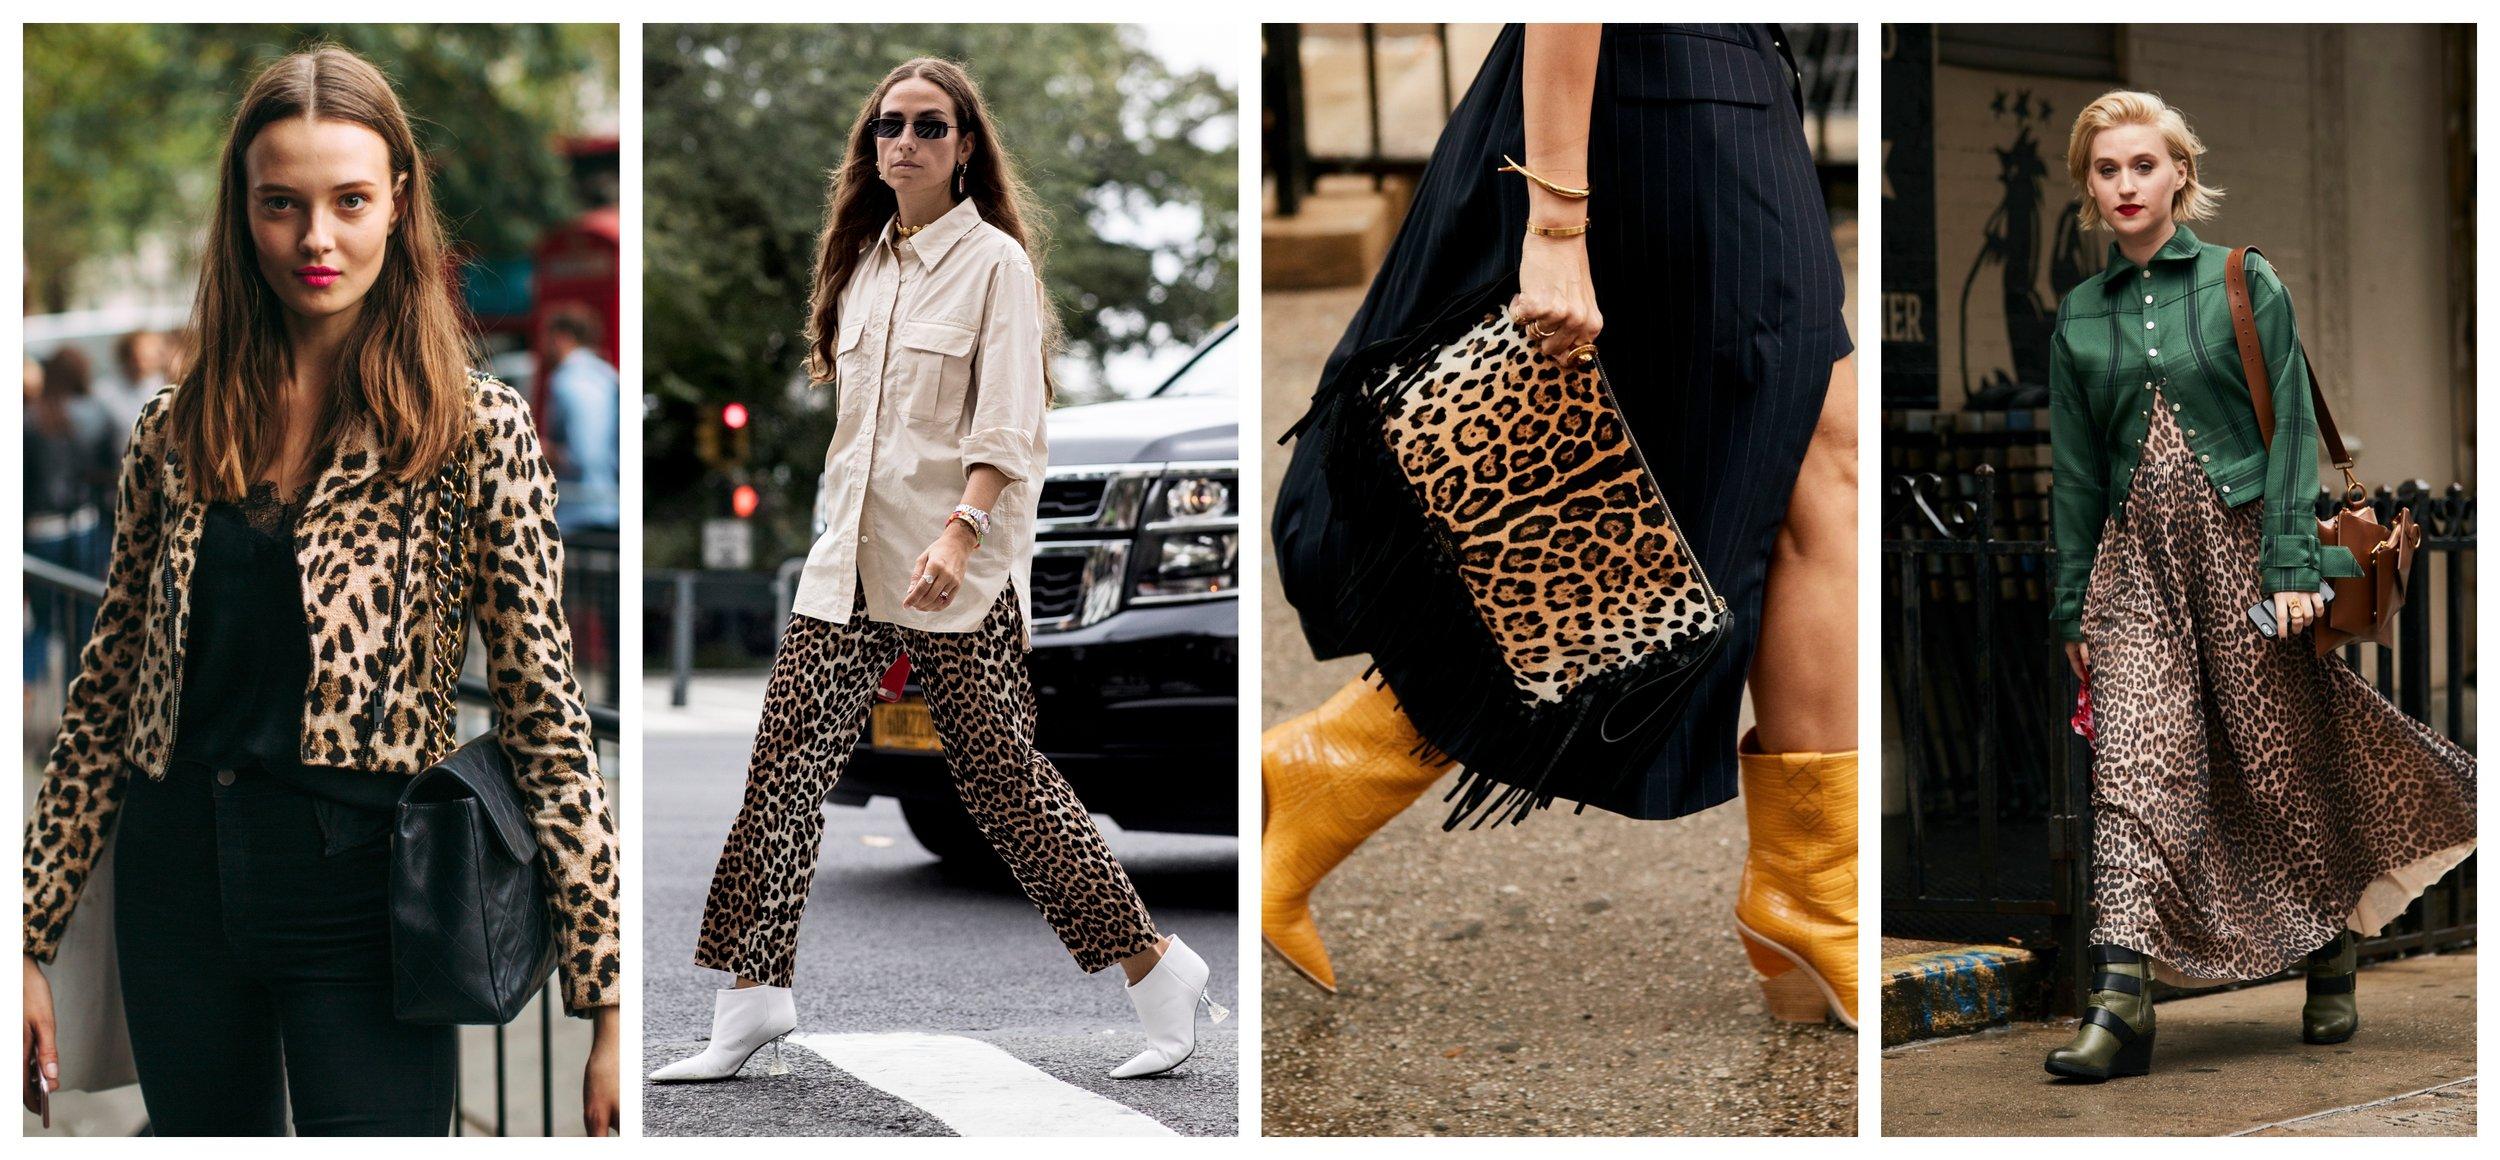 cheetah girls.jpg